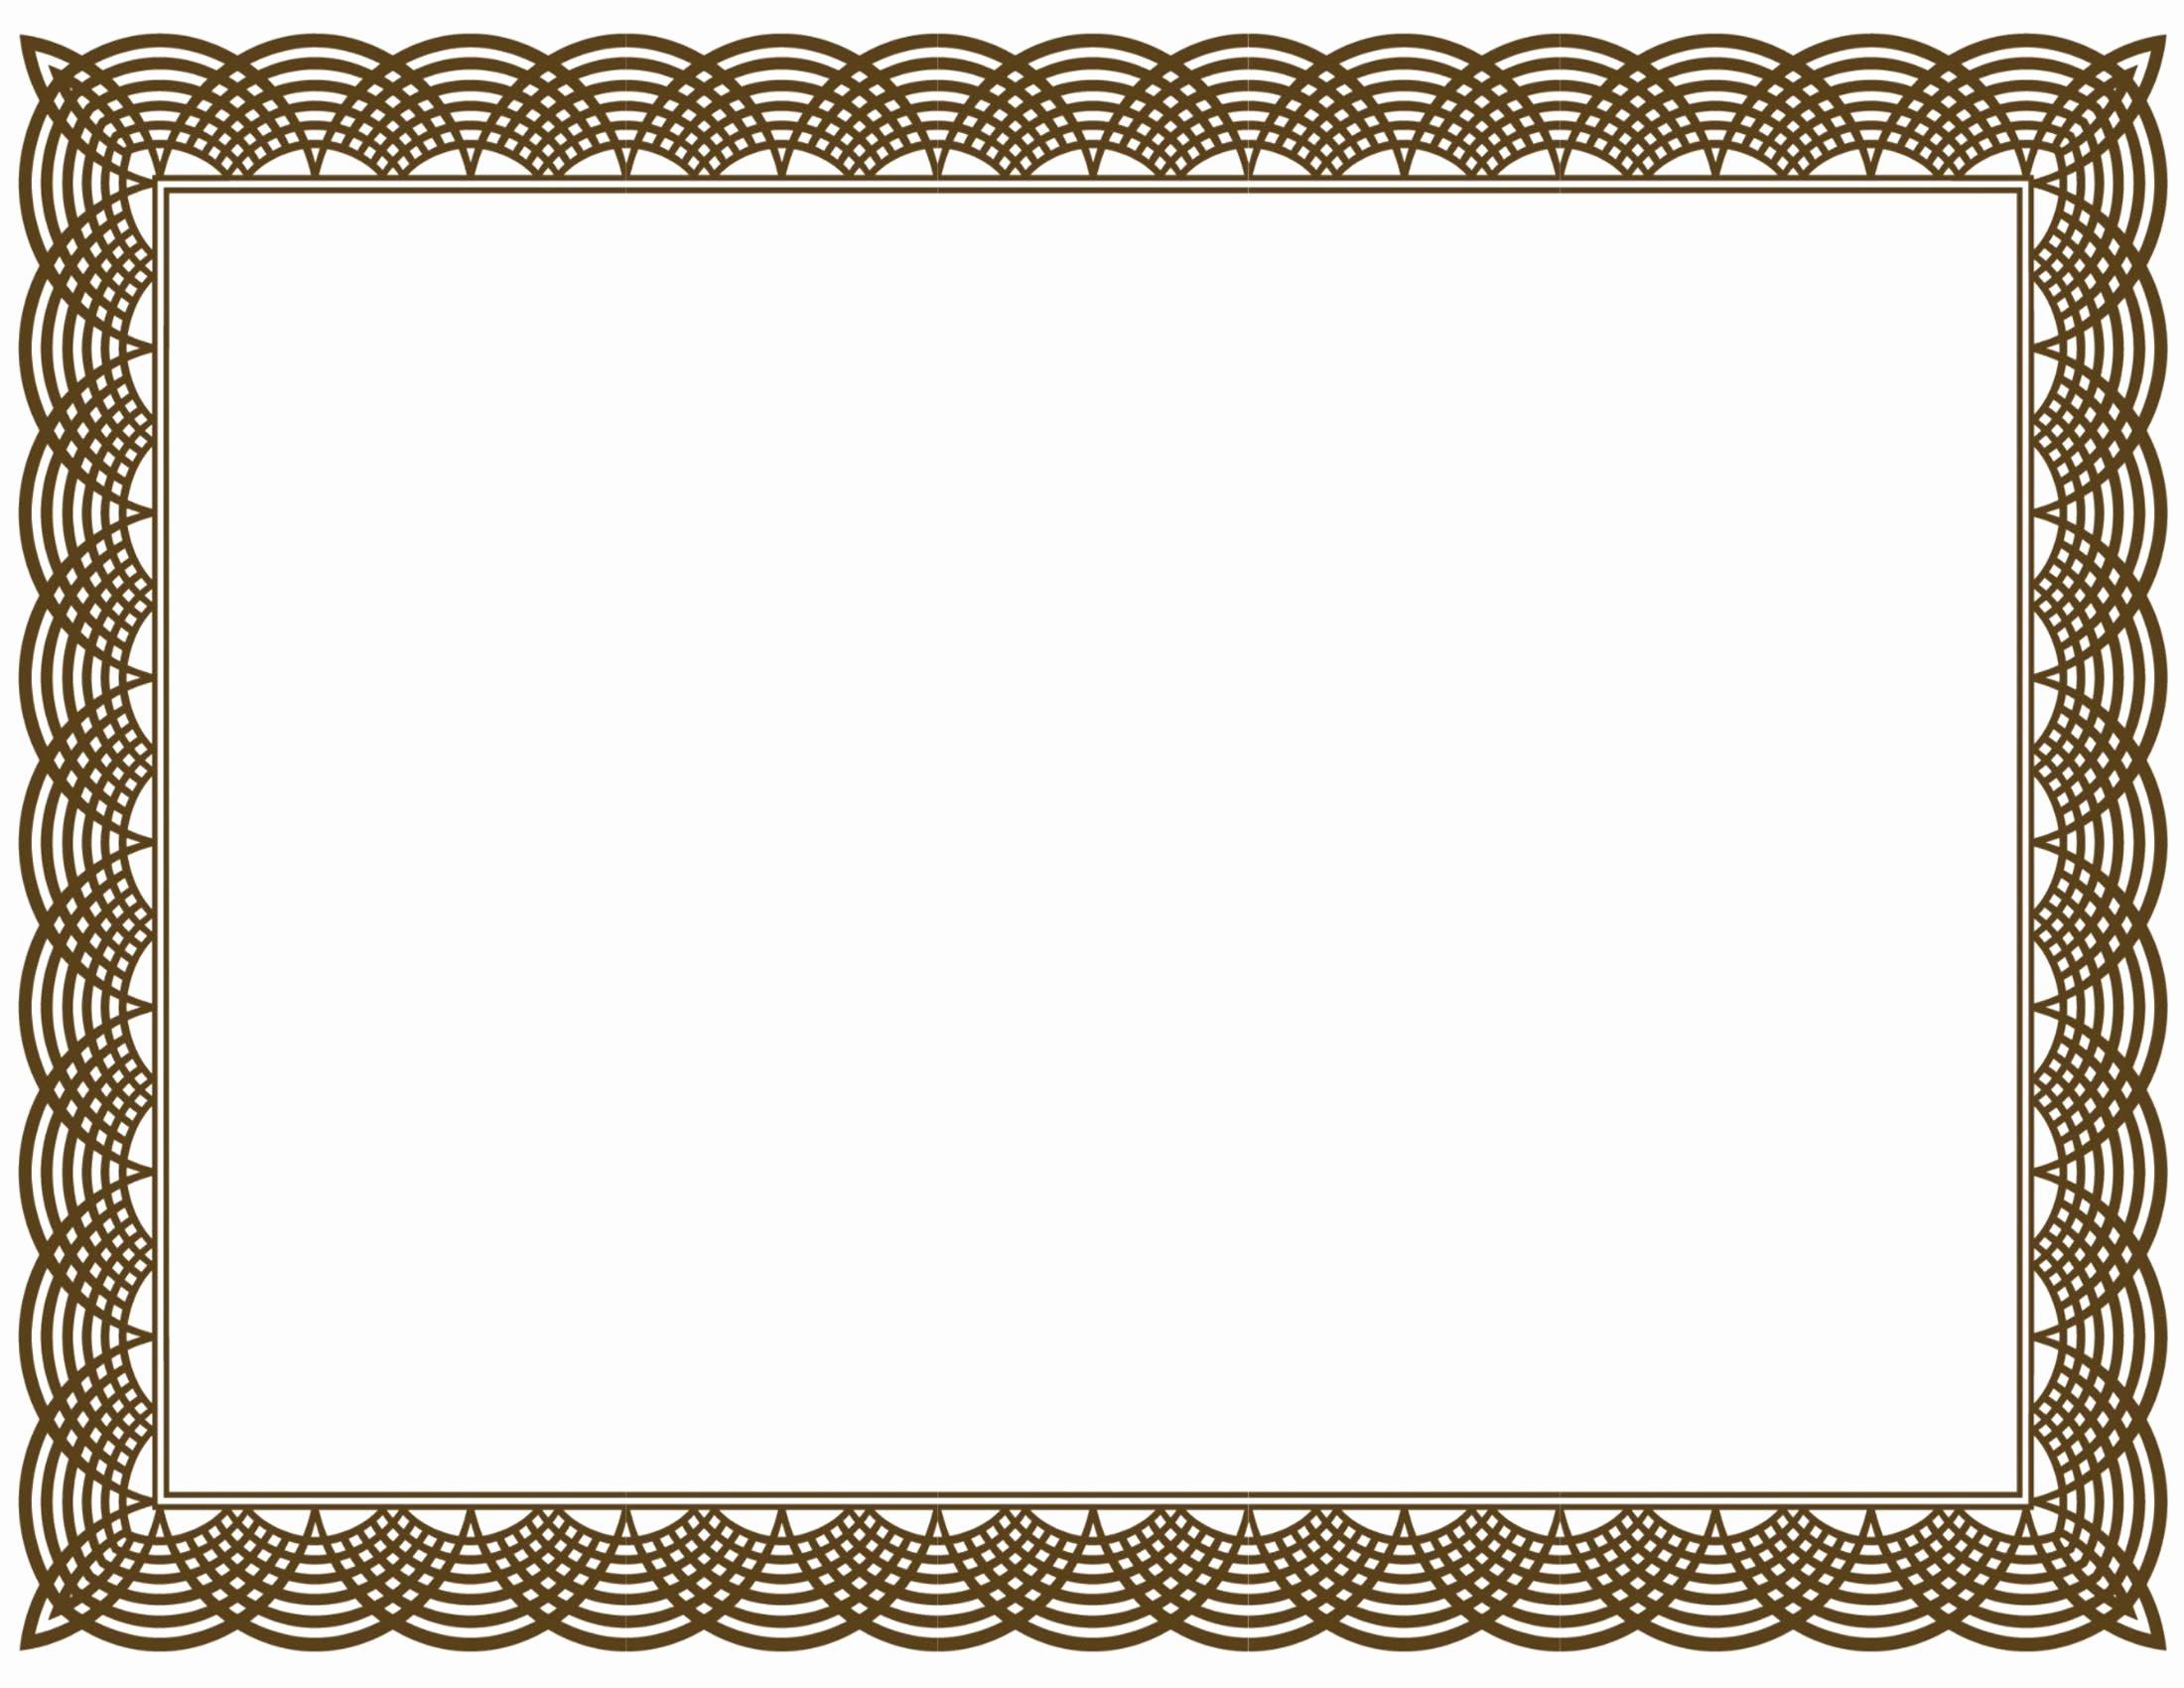 Award Certificate Clip Art Inspirational Award Certificate Border Clip Art Pdf